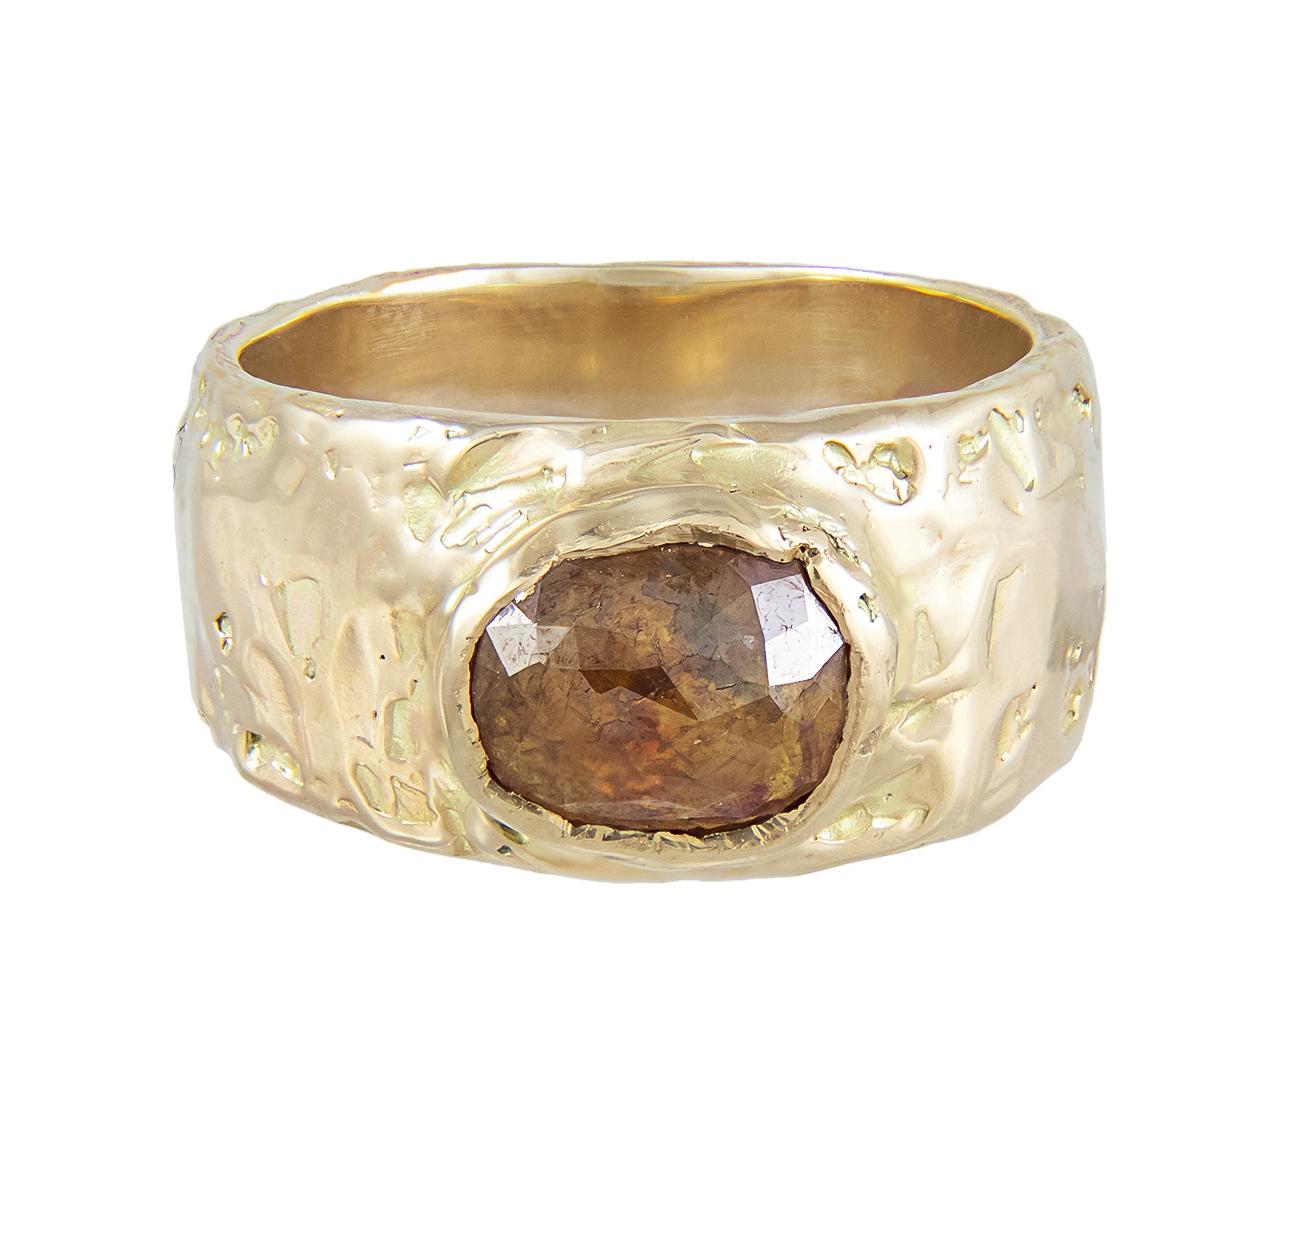 XCI ORANGE DIAMOND WIDE RING